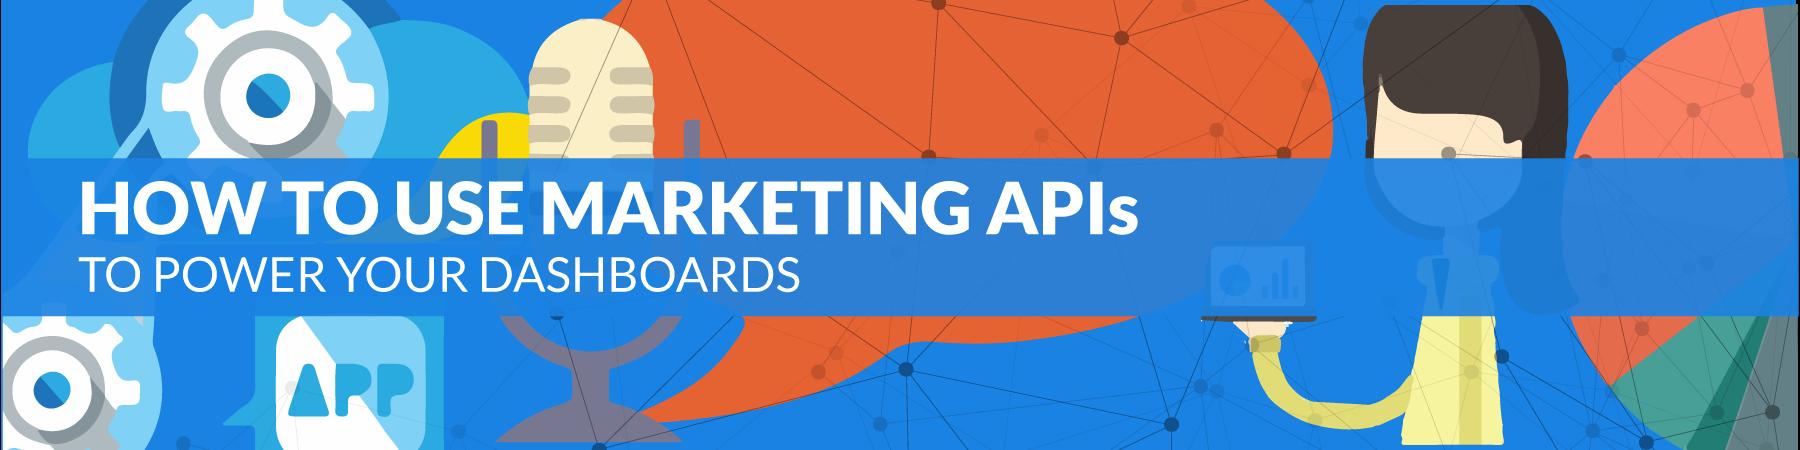 marketing-api-infographic-banner